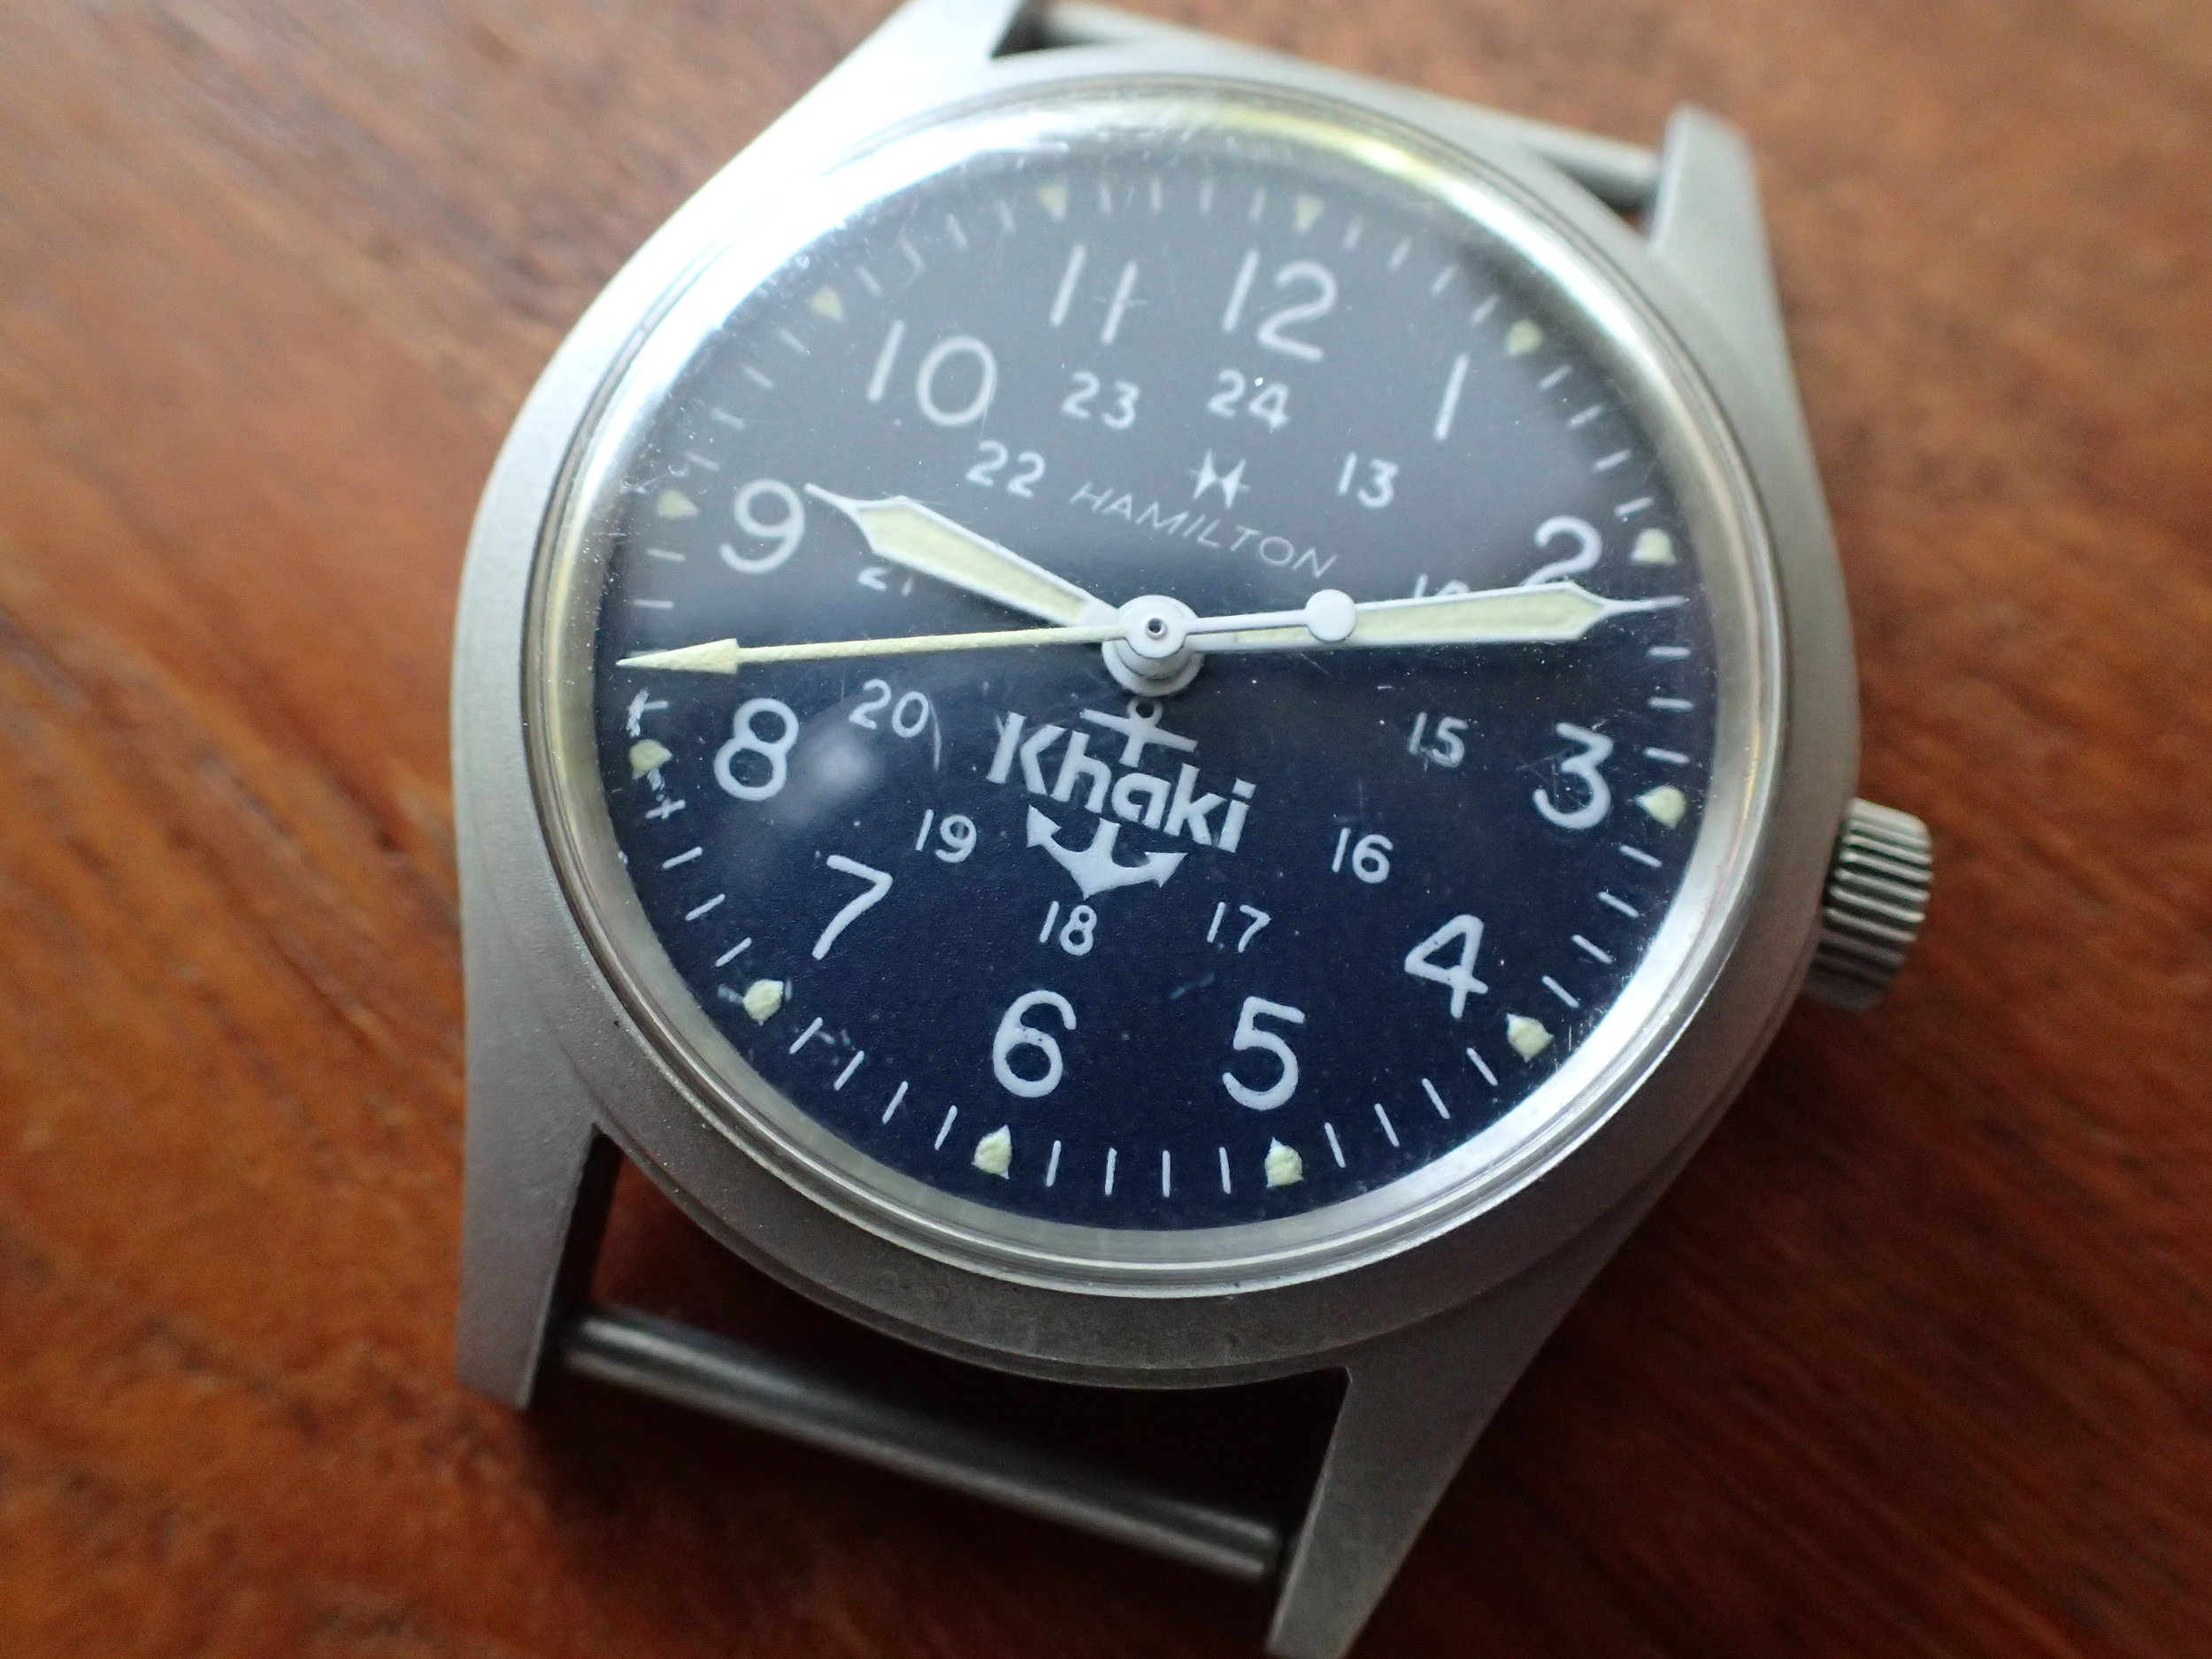 The Hamilton Khaki Mate. Note the blue anchor dial.